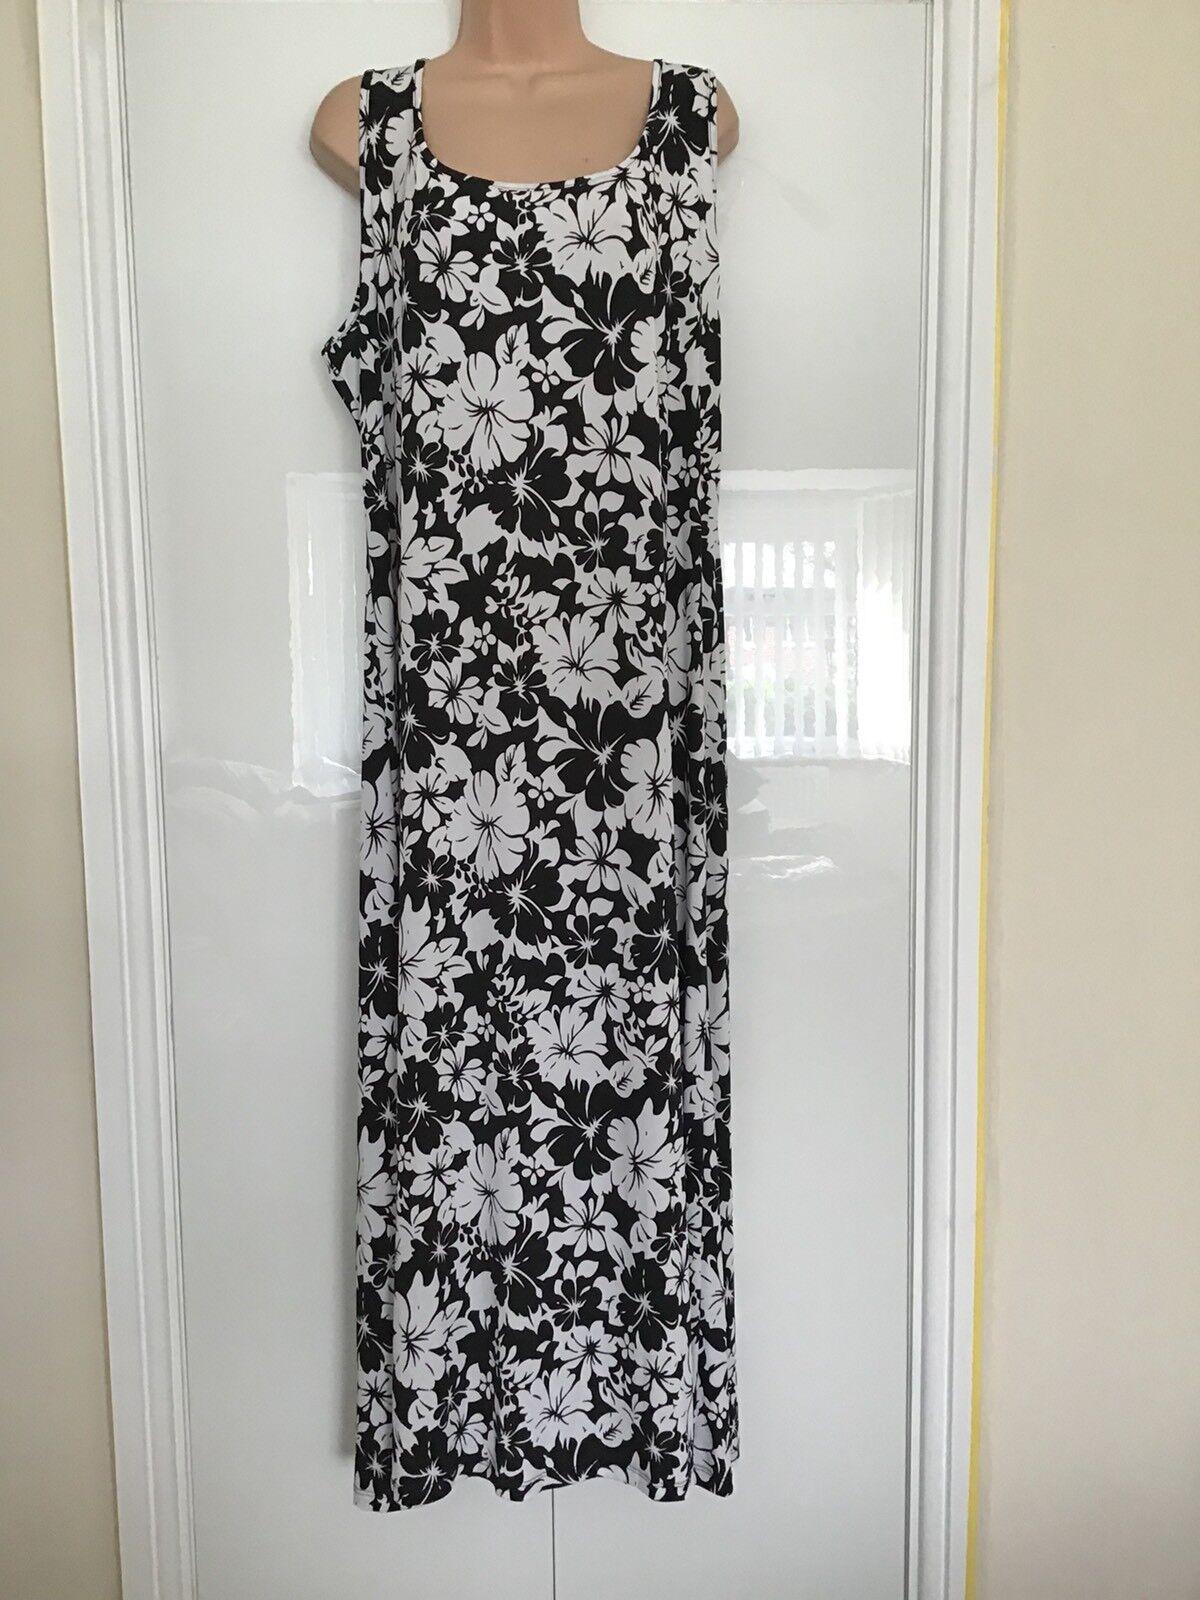 Kim & Co Monotone Floral Sleeveless A Line Maxi Dress Small